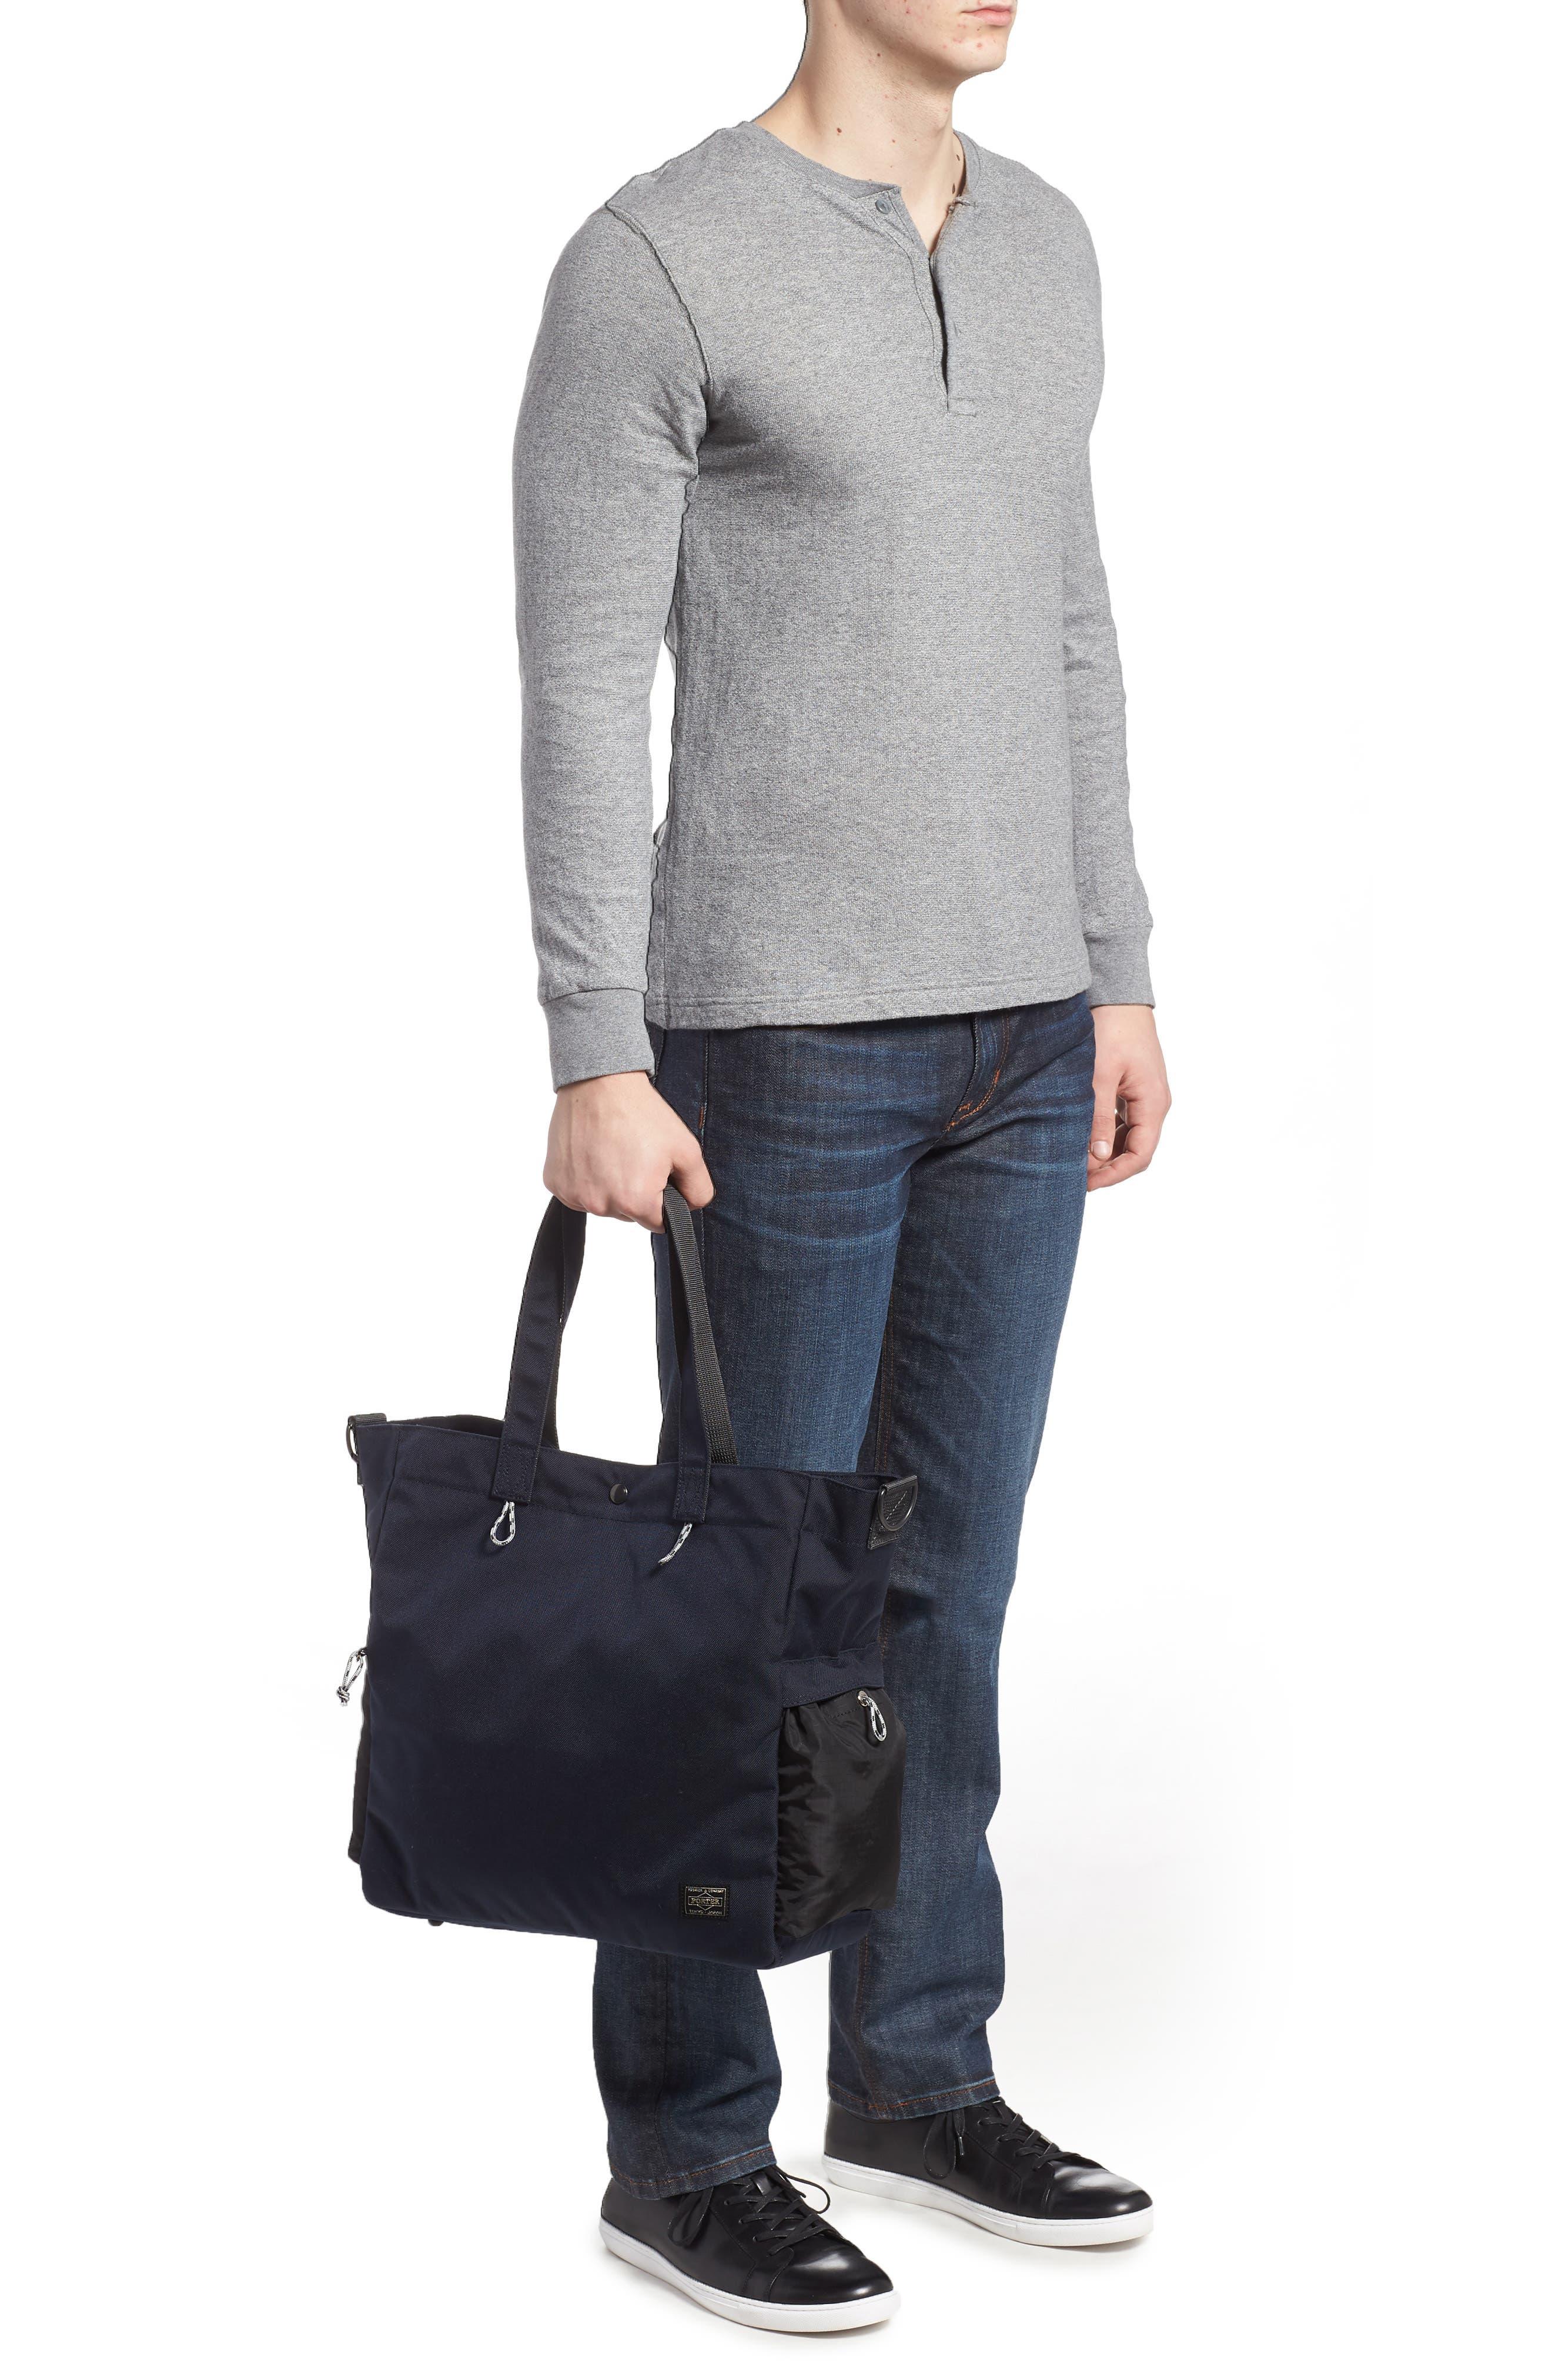 Porter-Yoshida & Co. Hype Tote Bag,                             Alternate thumbnail 2, color,                             Navy/ Black